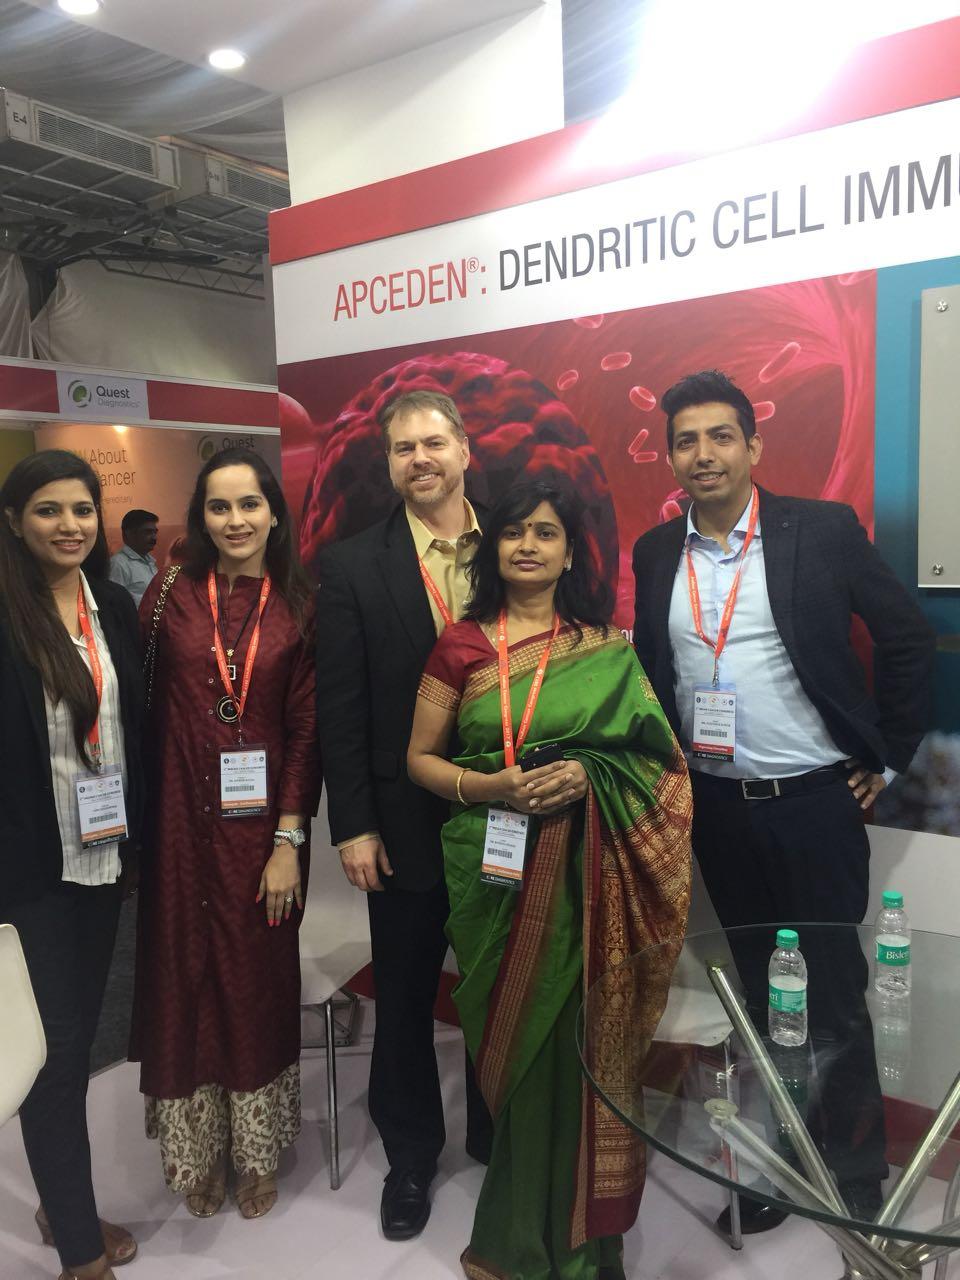 Apac Biotech with dr decker.jpg